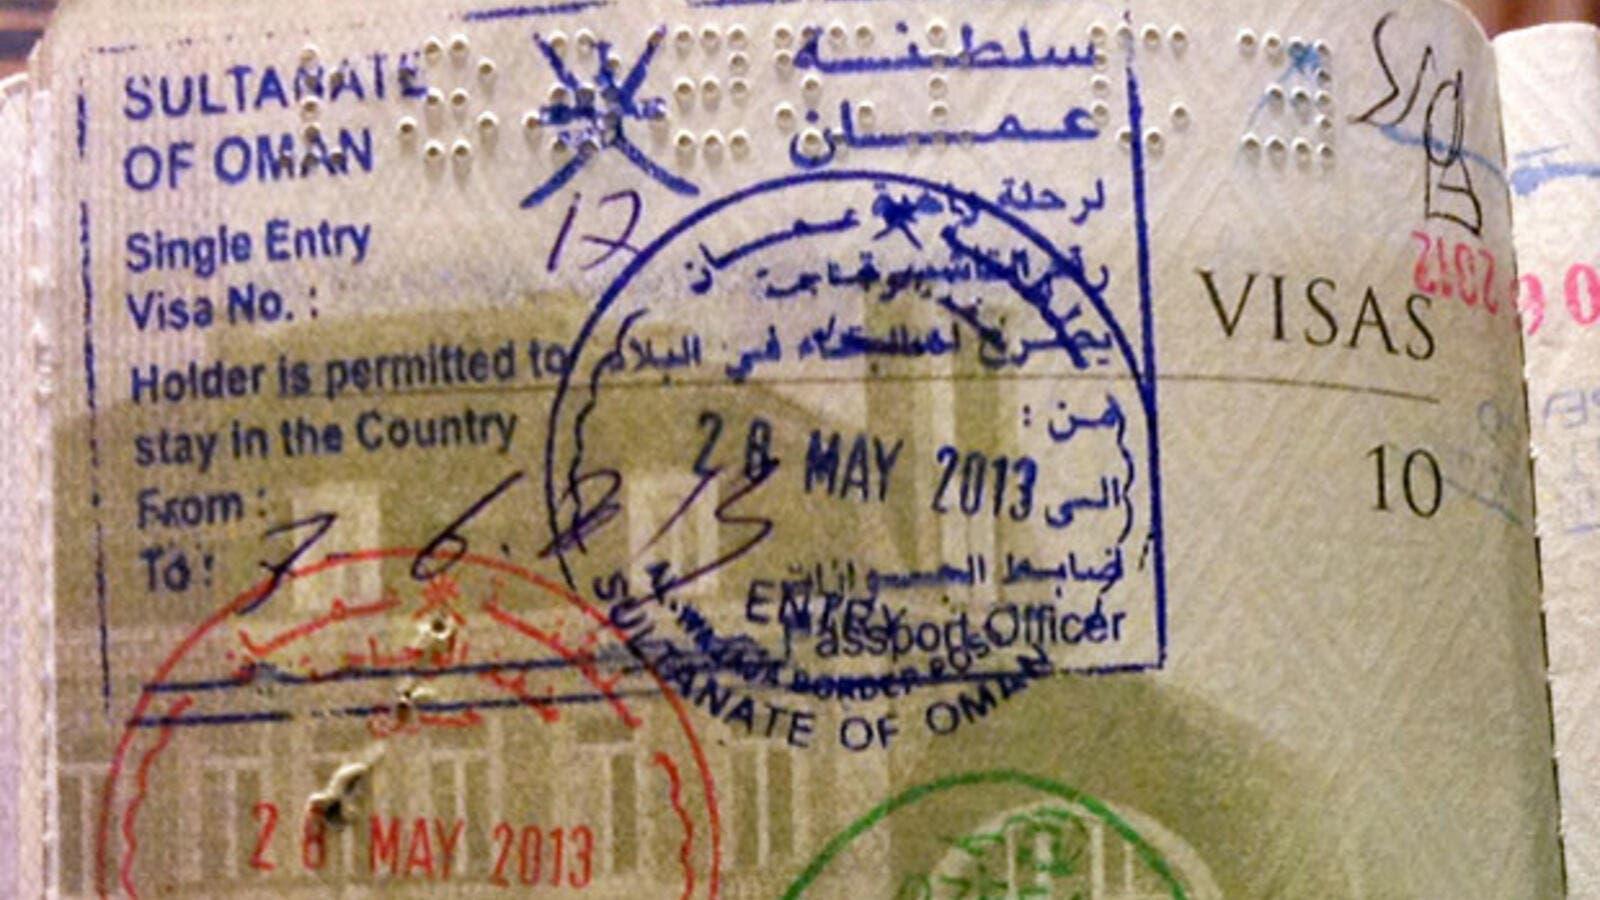 Oman recruitment agencies decry difficulties in obtaining visas for